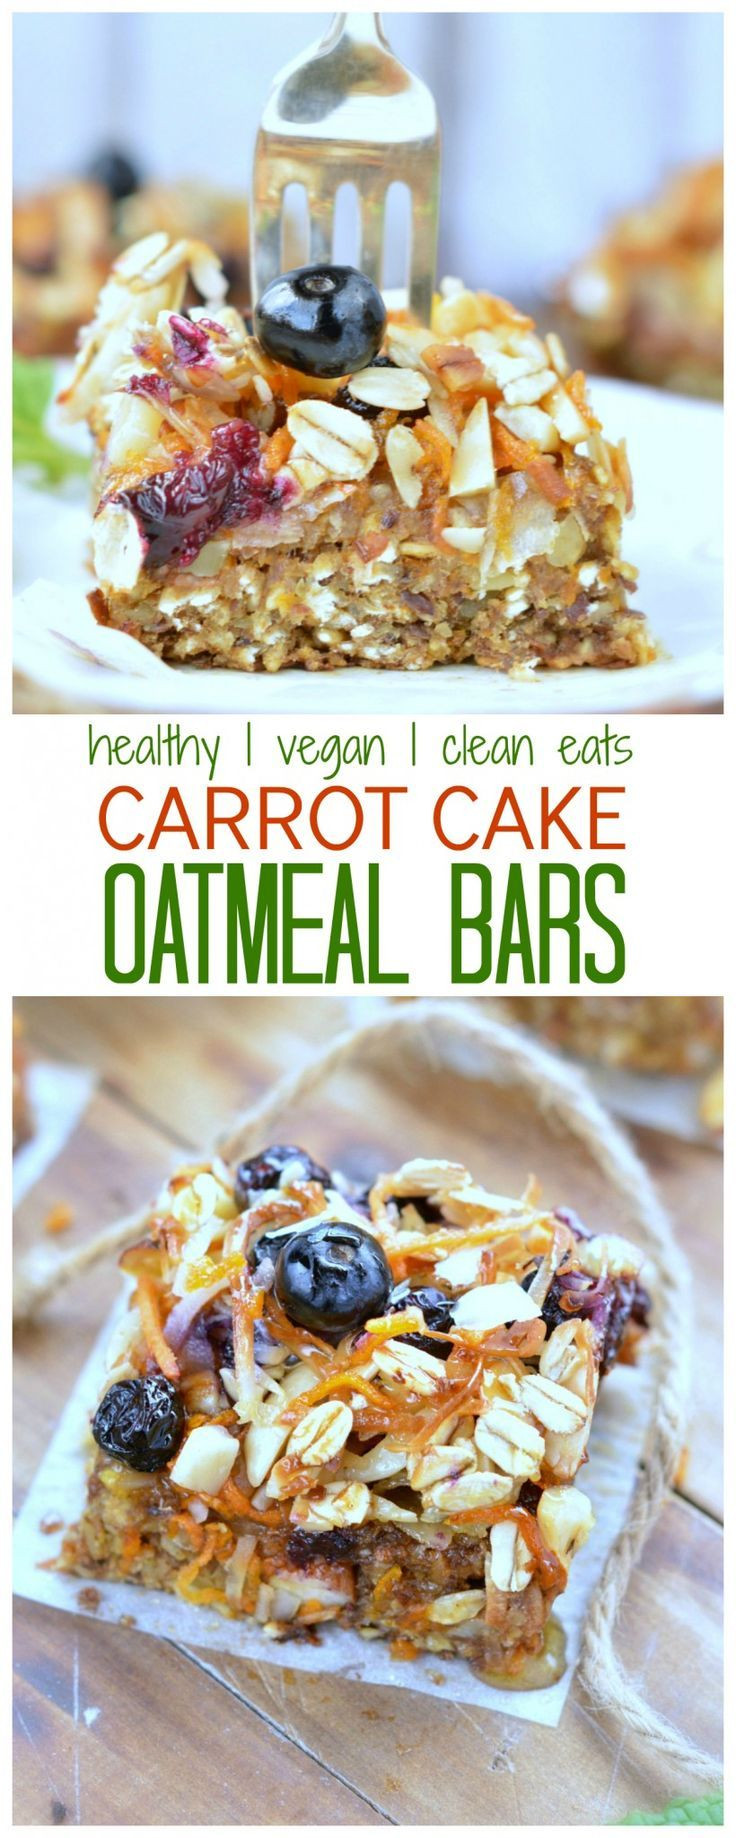 Healthy Oatmeal Breakfast Bars Recipe Easy  Carrot Cake Baked Oatmeal Bars